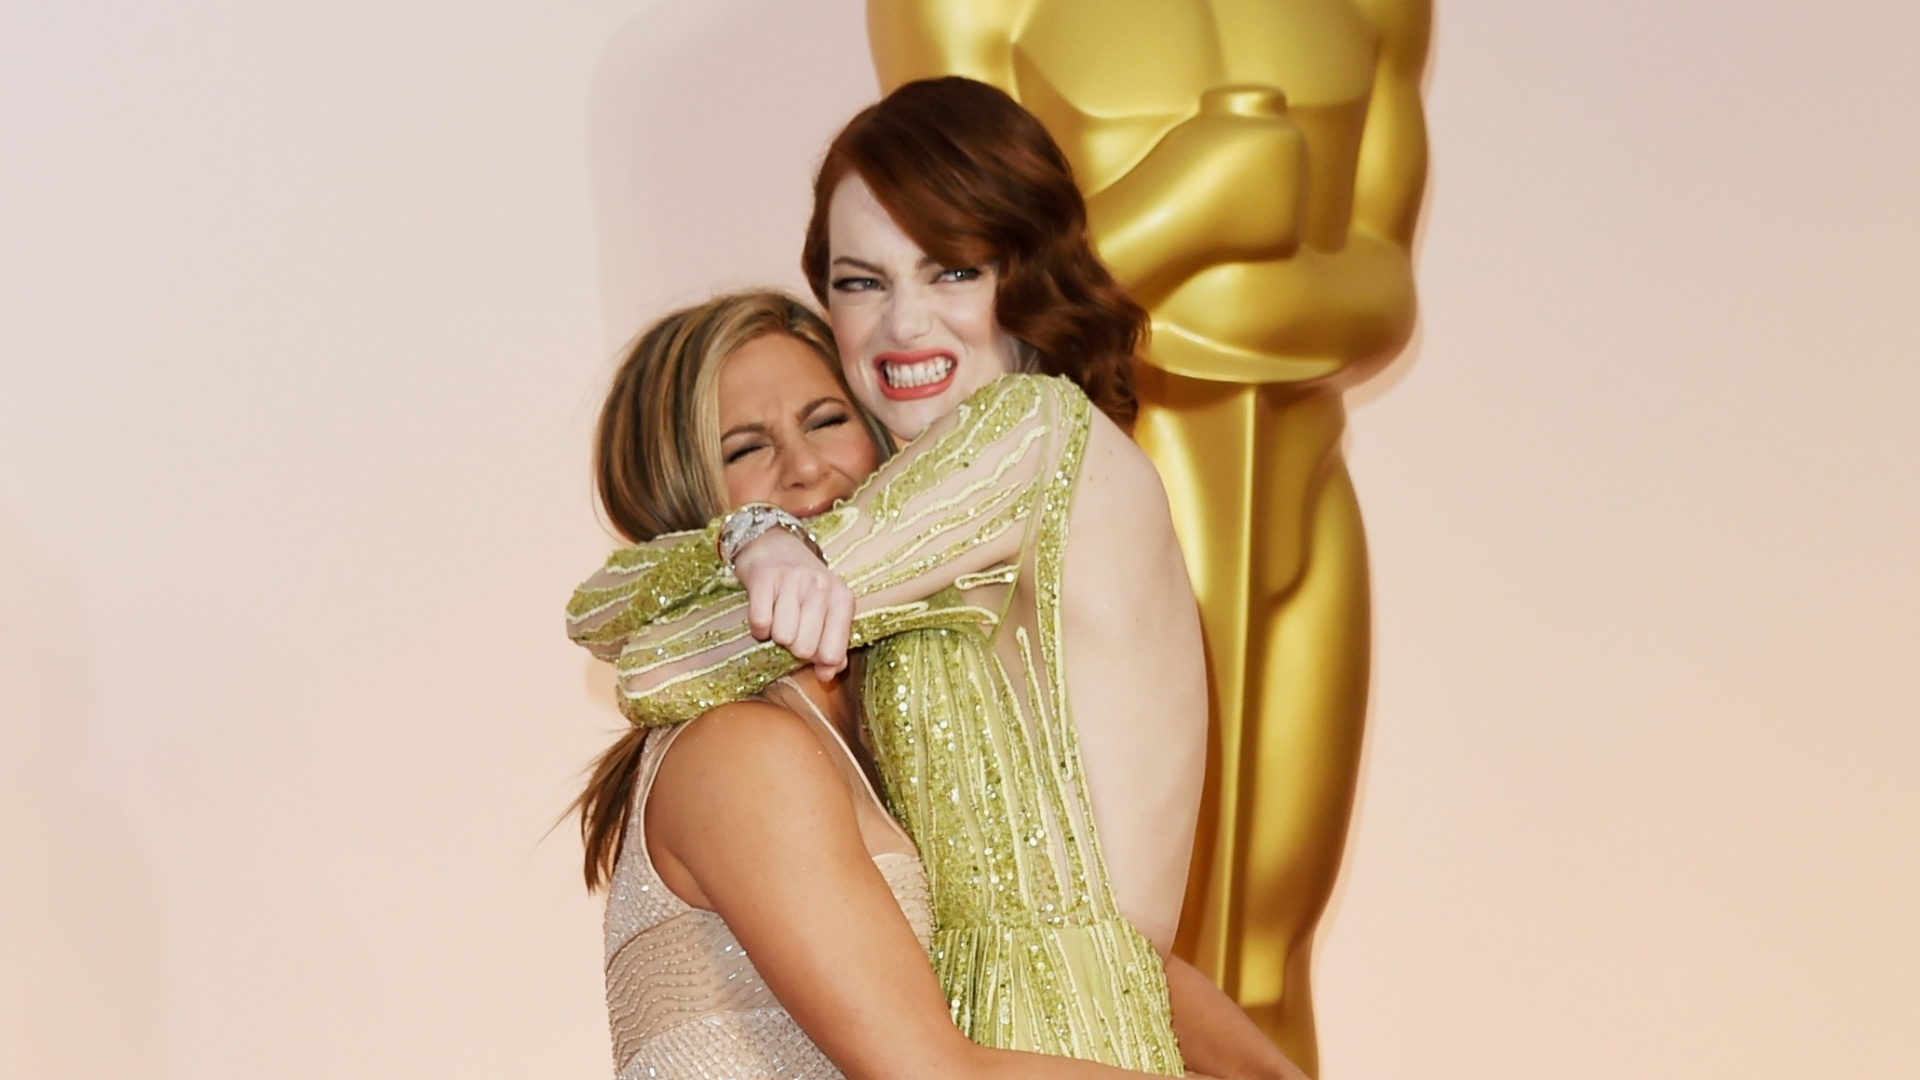 22.fev.2015 - Jennifer Aniston e Emma Stone se abraçam na chegada do Oscar 2015